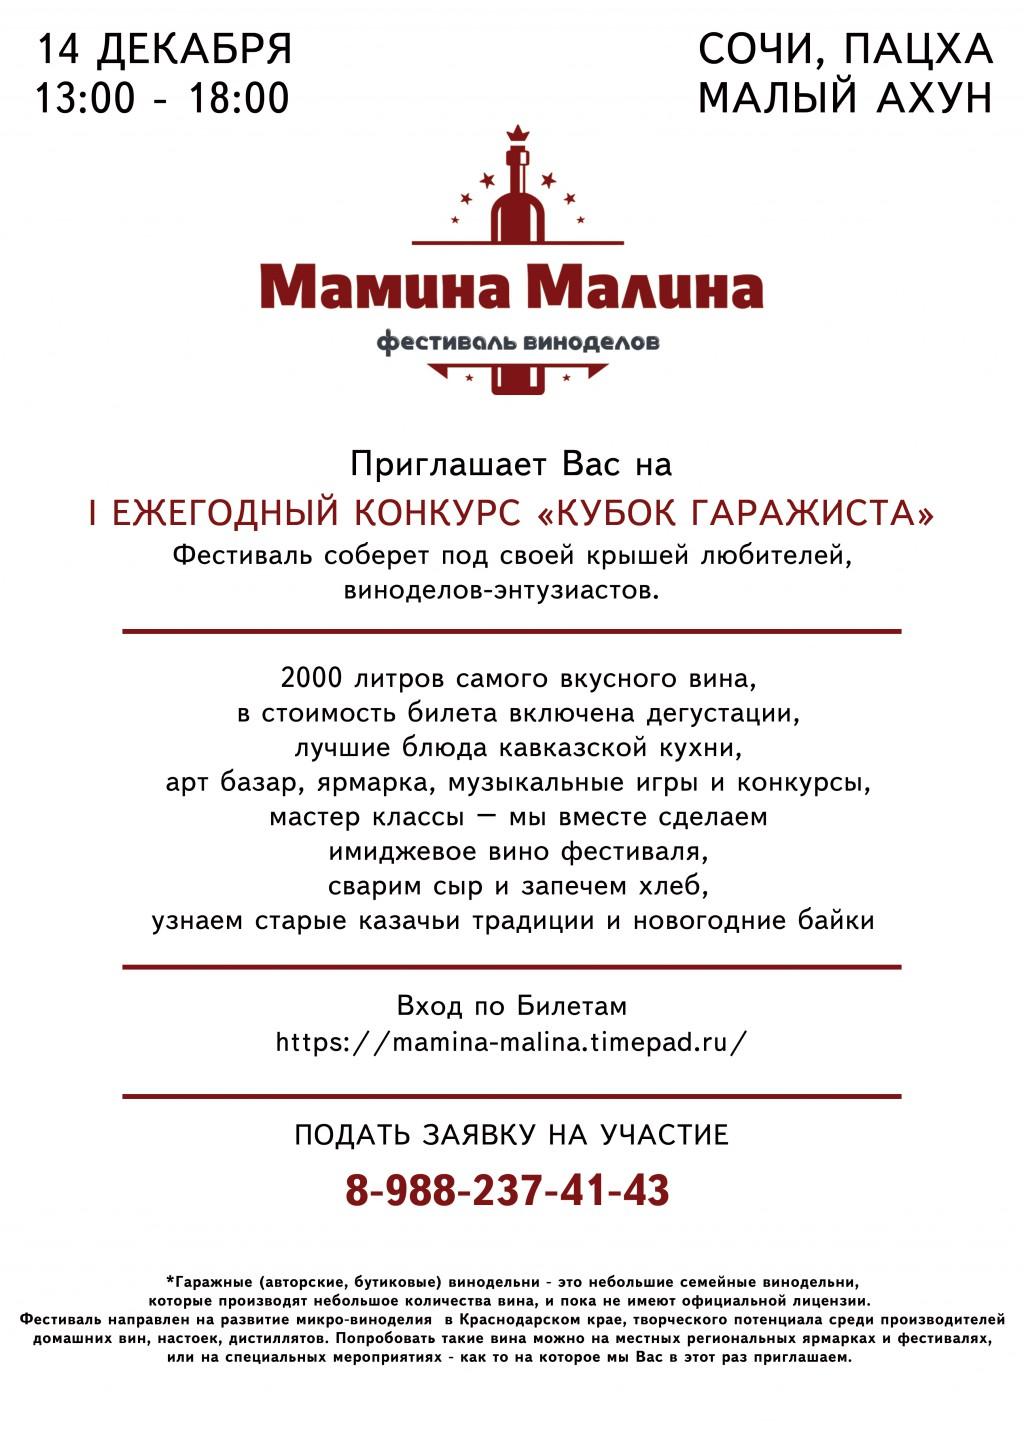 Мамина Малина фестиваль виноделов Сочи